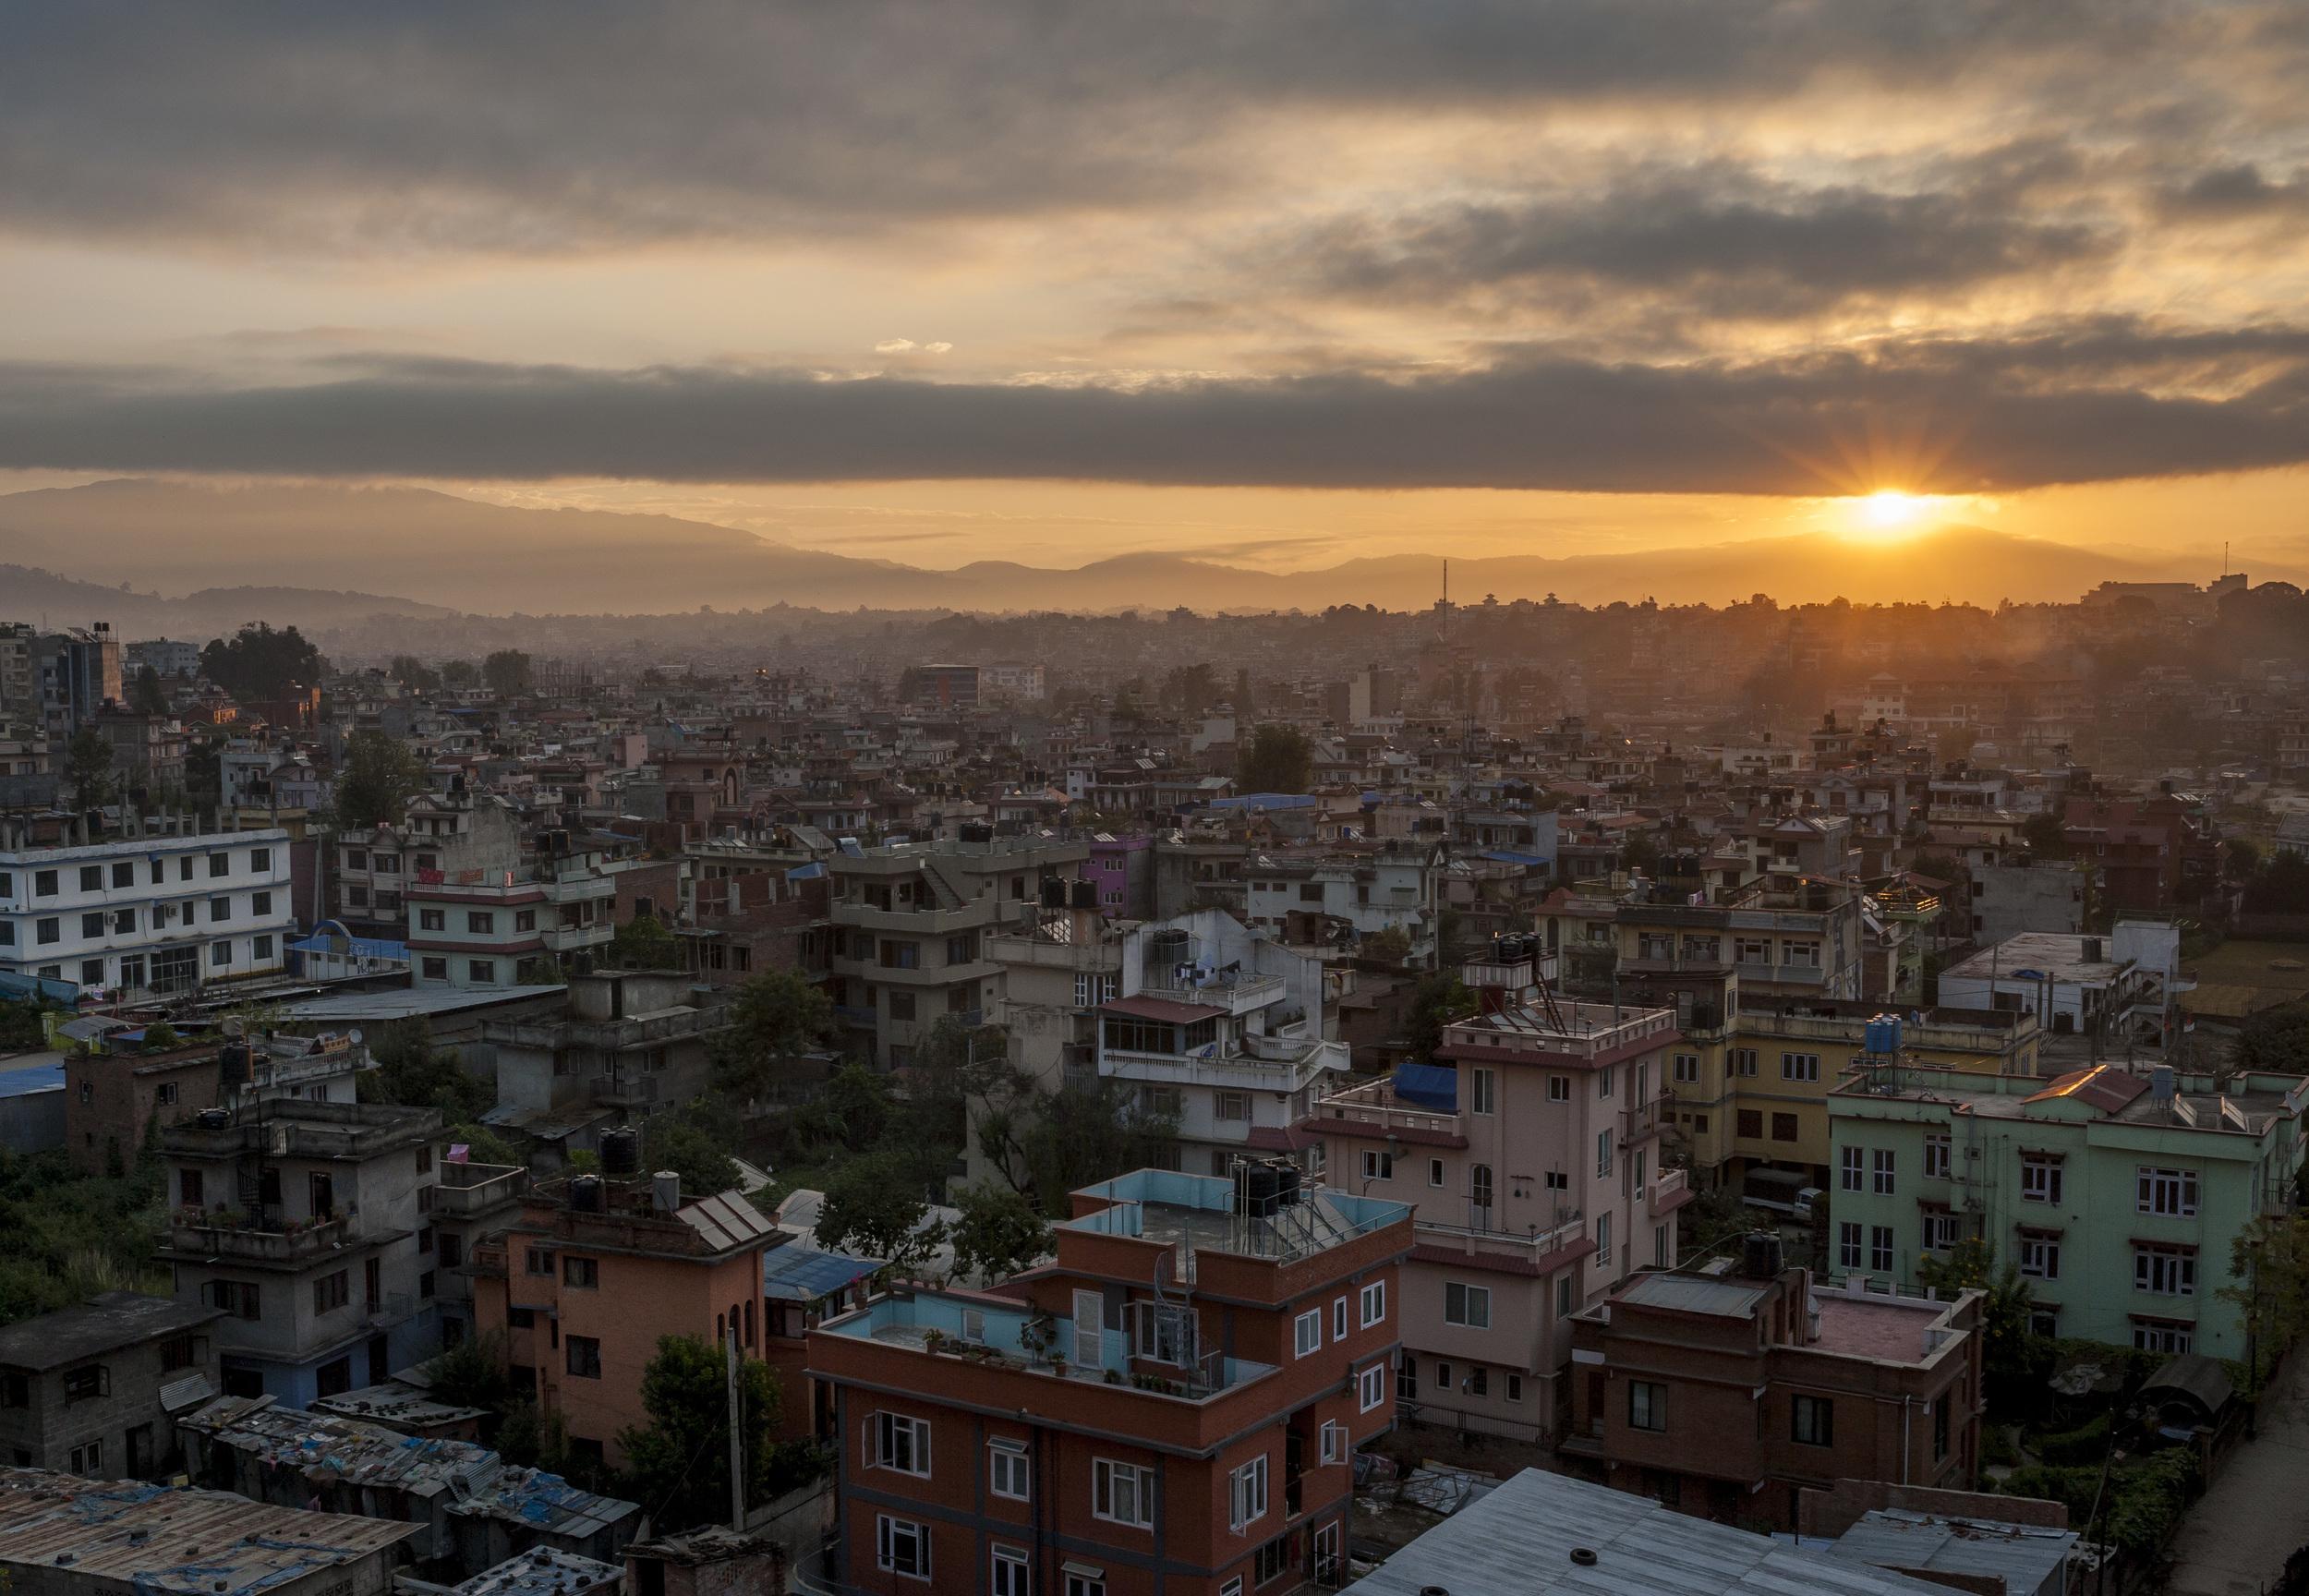 Sunrise over Kathmandu